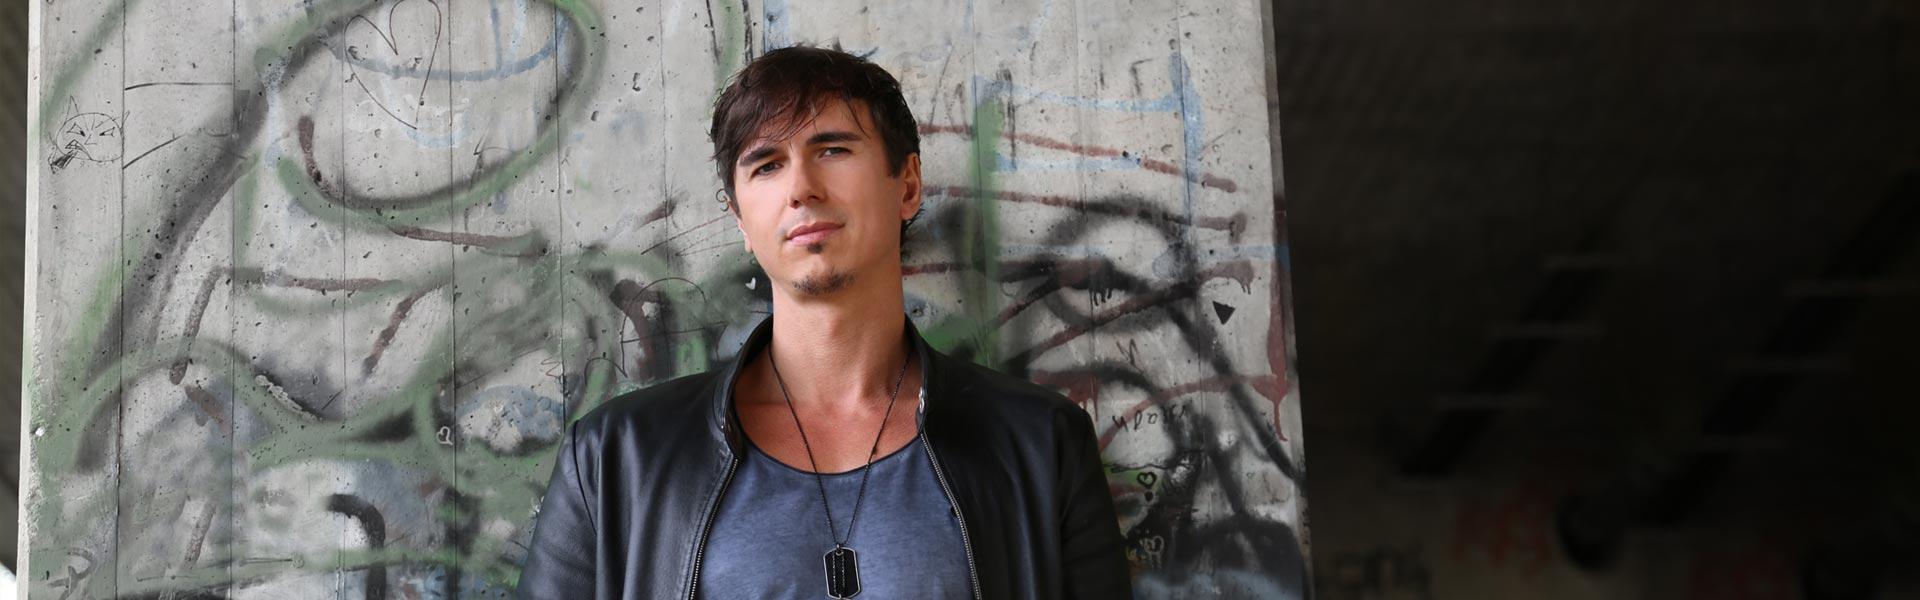 Björn Martins Sänger Songwriter Musiker News